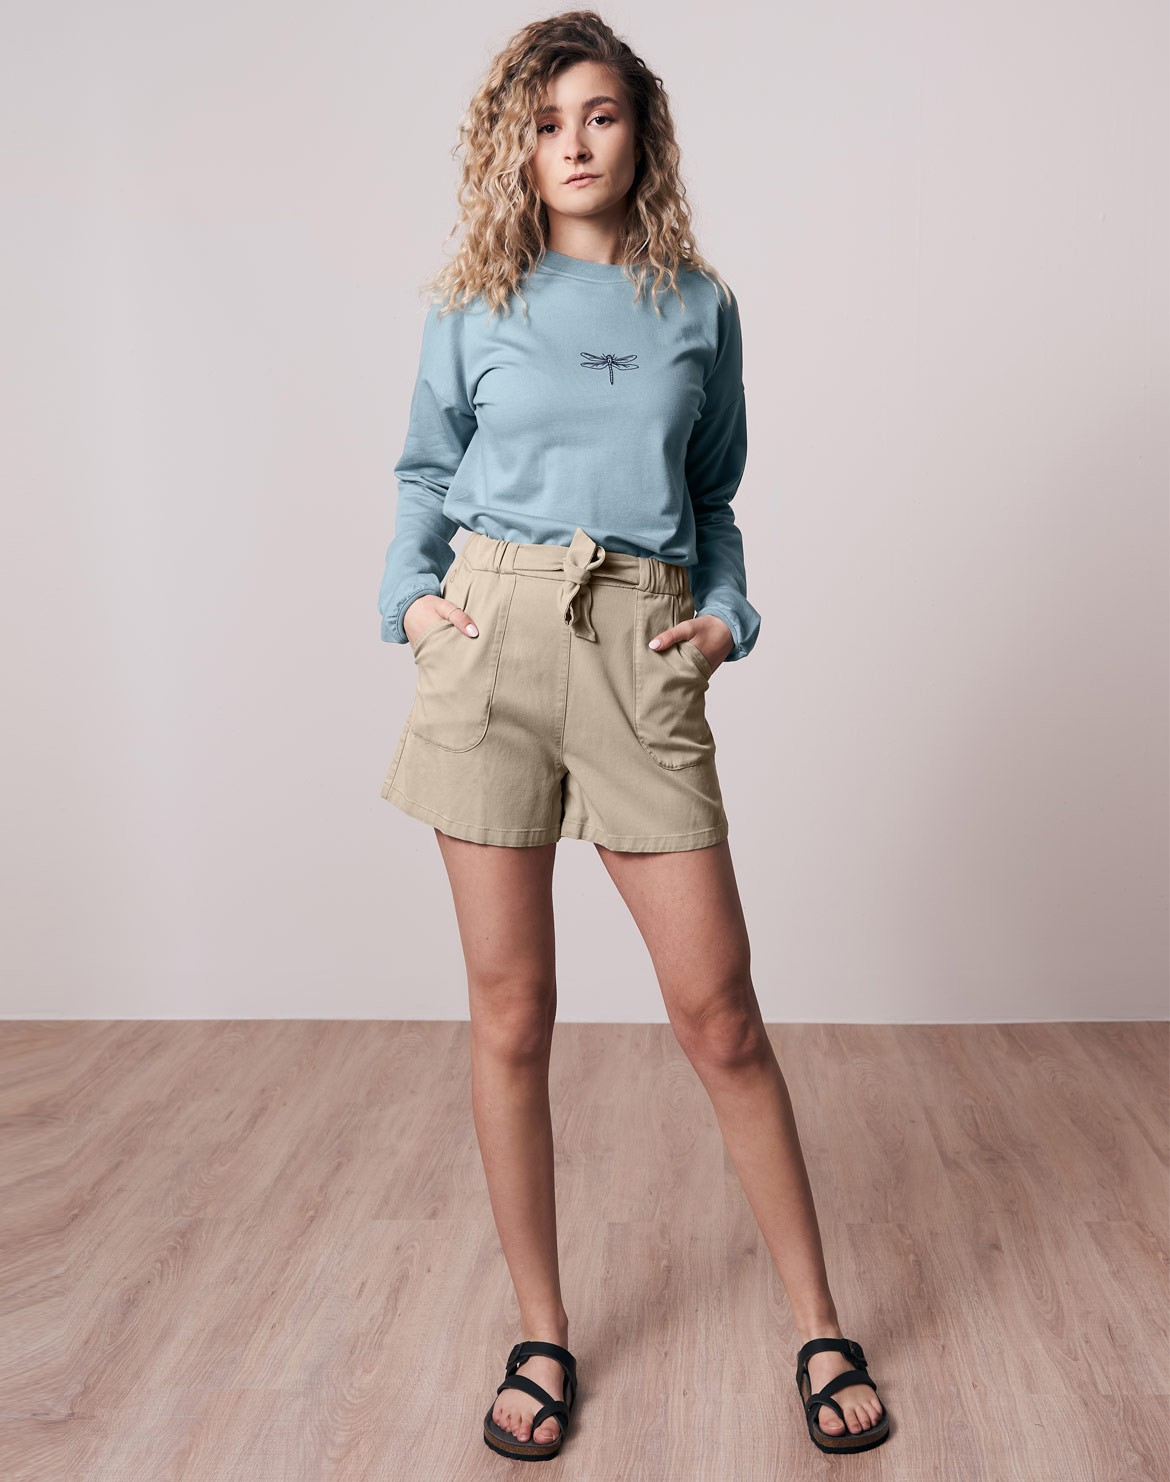 Easyaspie Lyocell (TENCEL™) Shorts